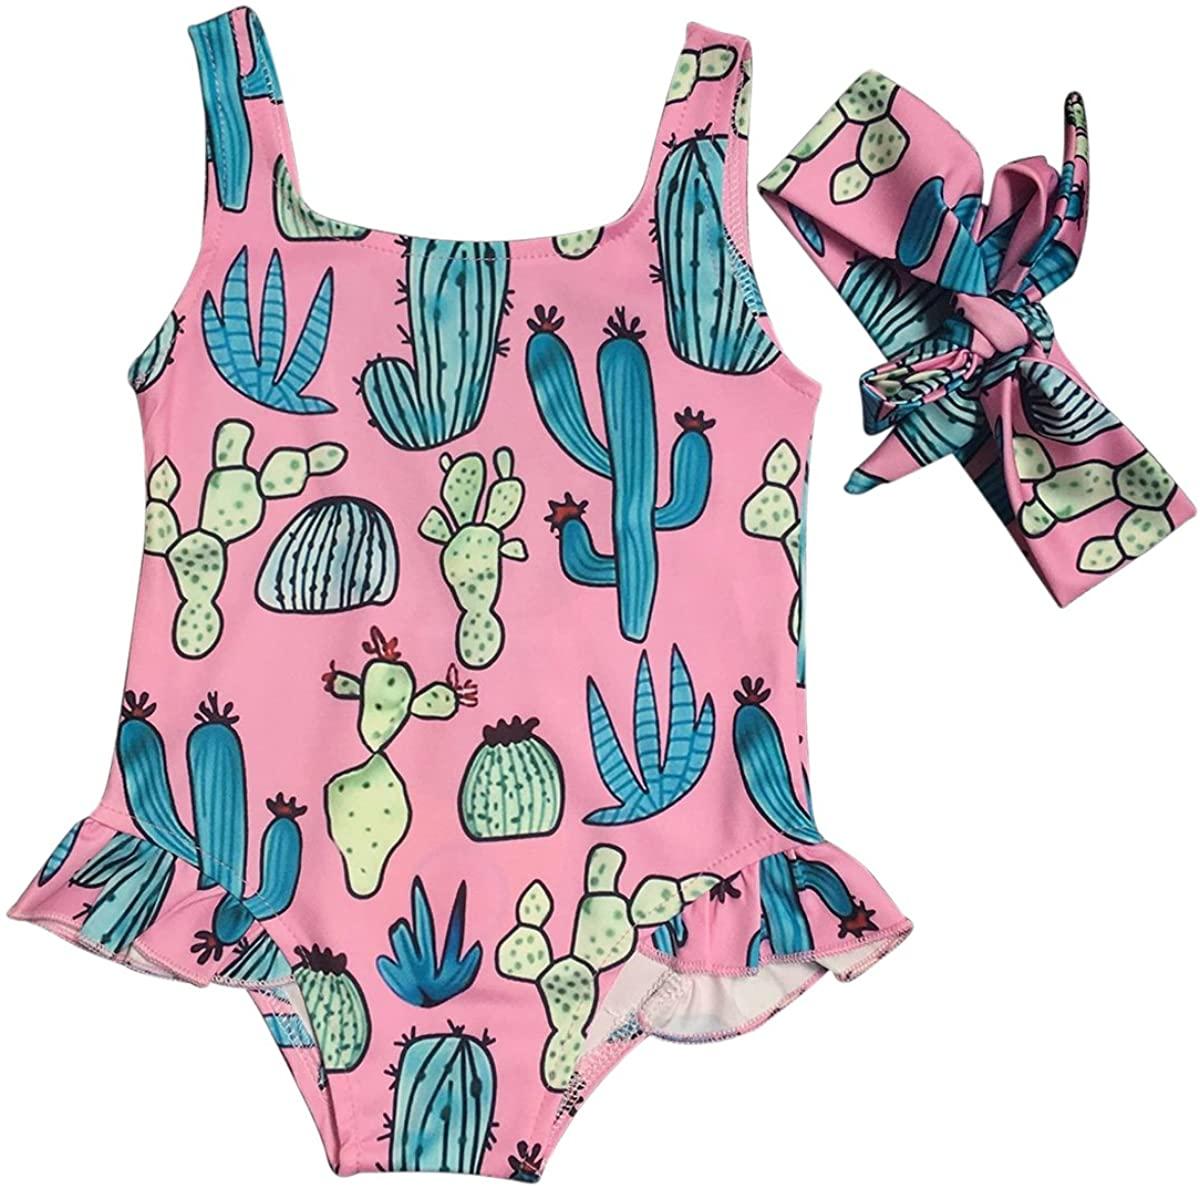 Infant Toddler Baby Girl Cactus Print One Piece Beachwear Swimsuit + Headband